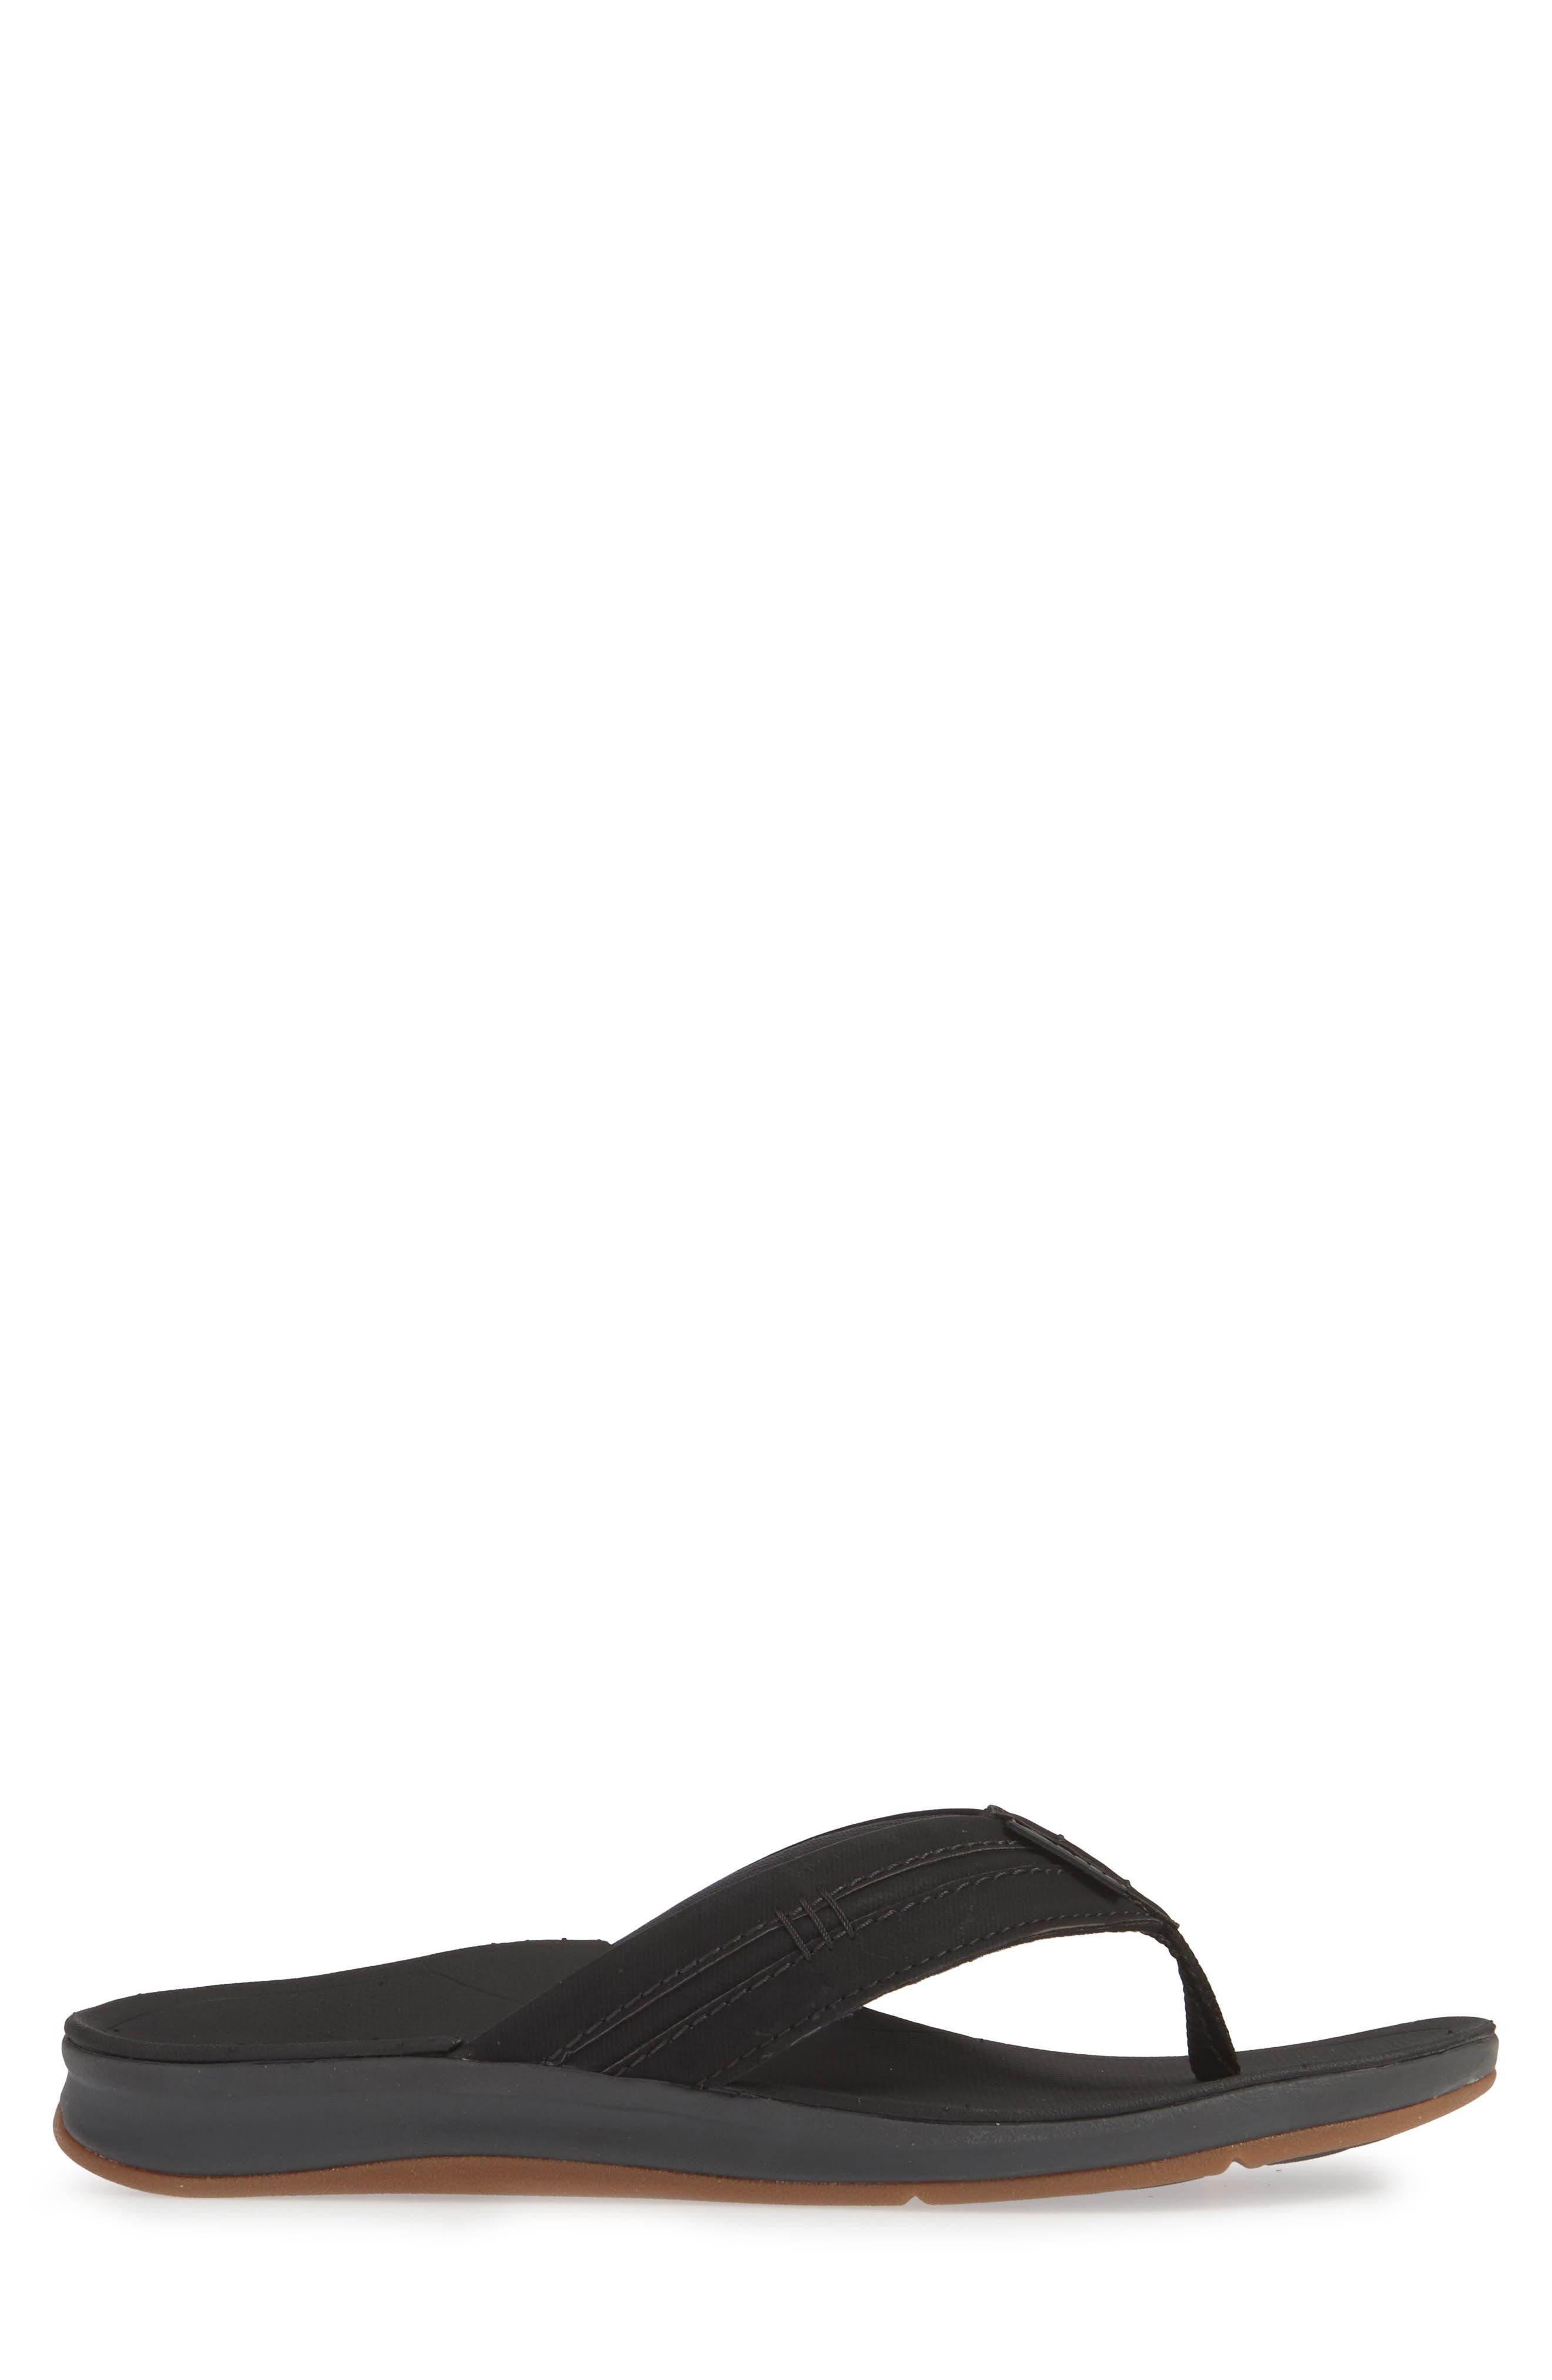 REEF, Ortho Bounce Coast Flip Flop, Alternate thumbnail 3, color, BLACK